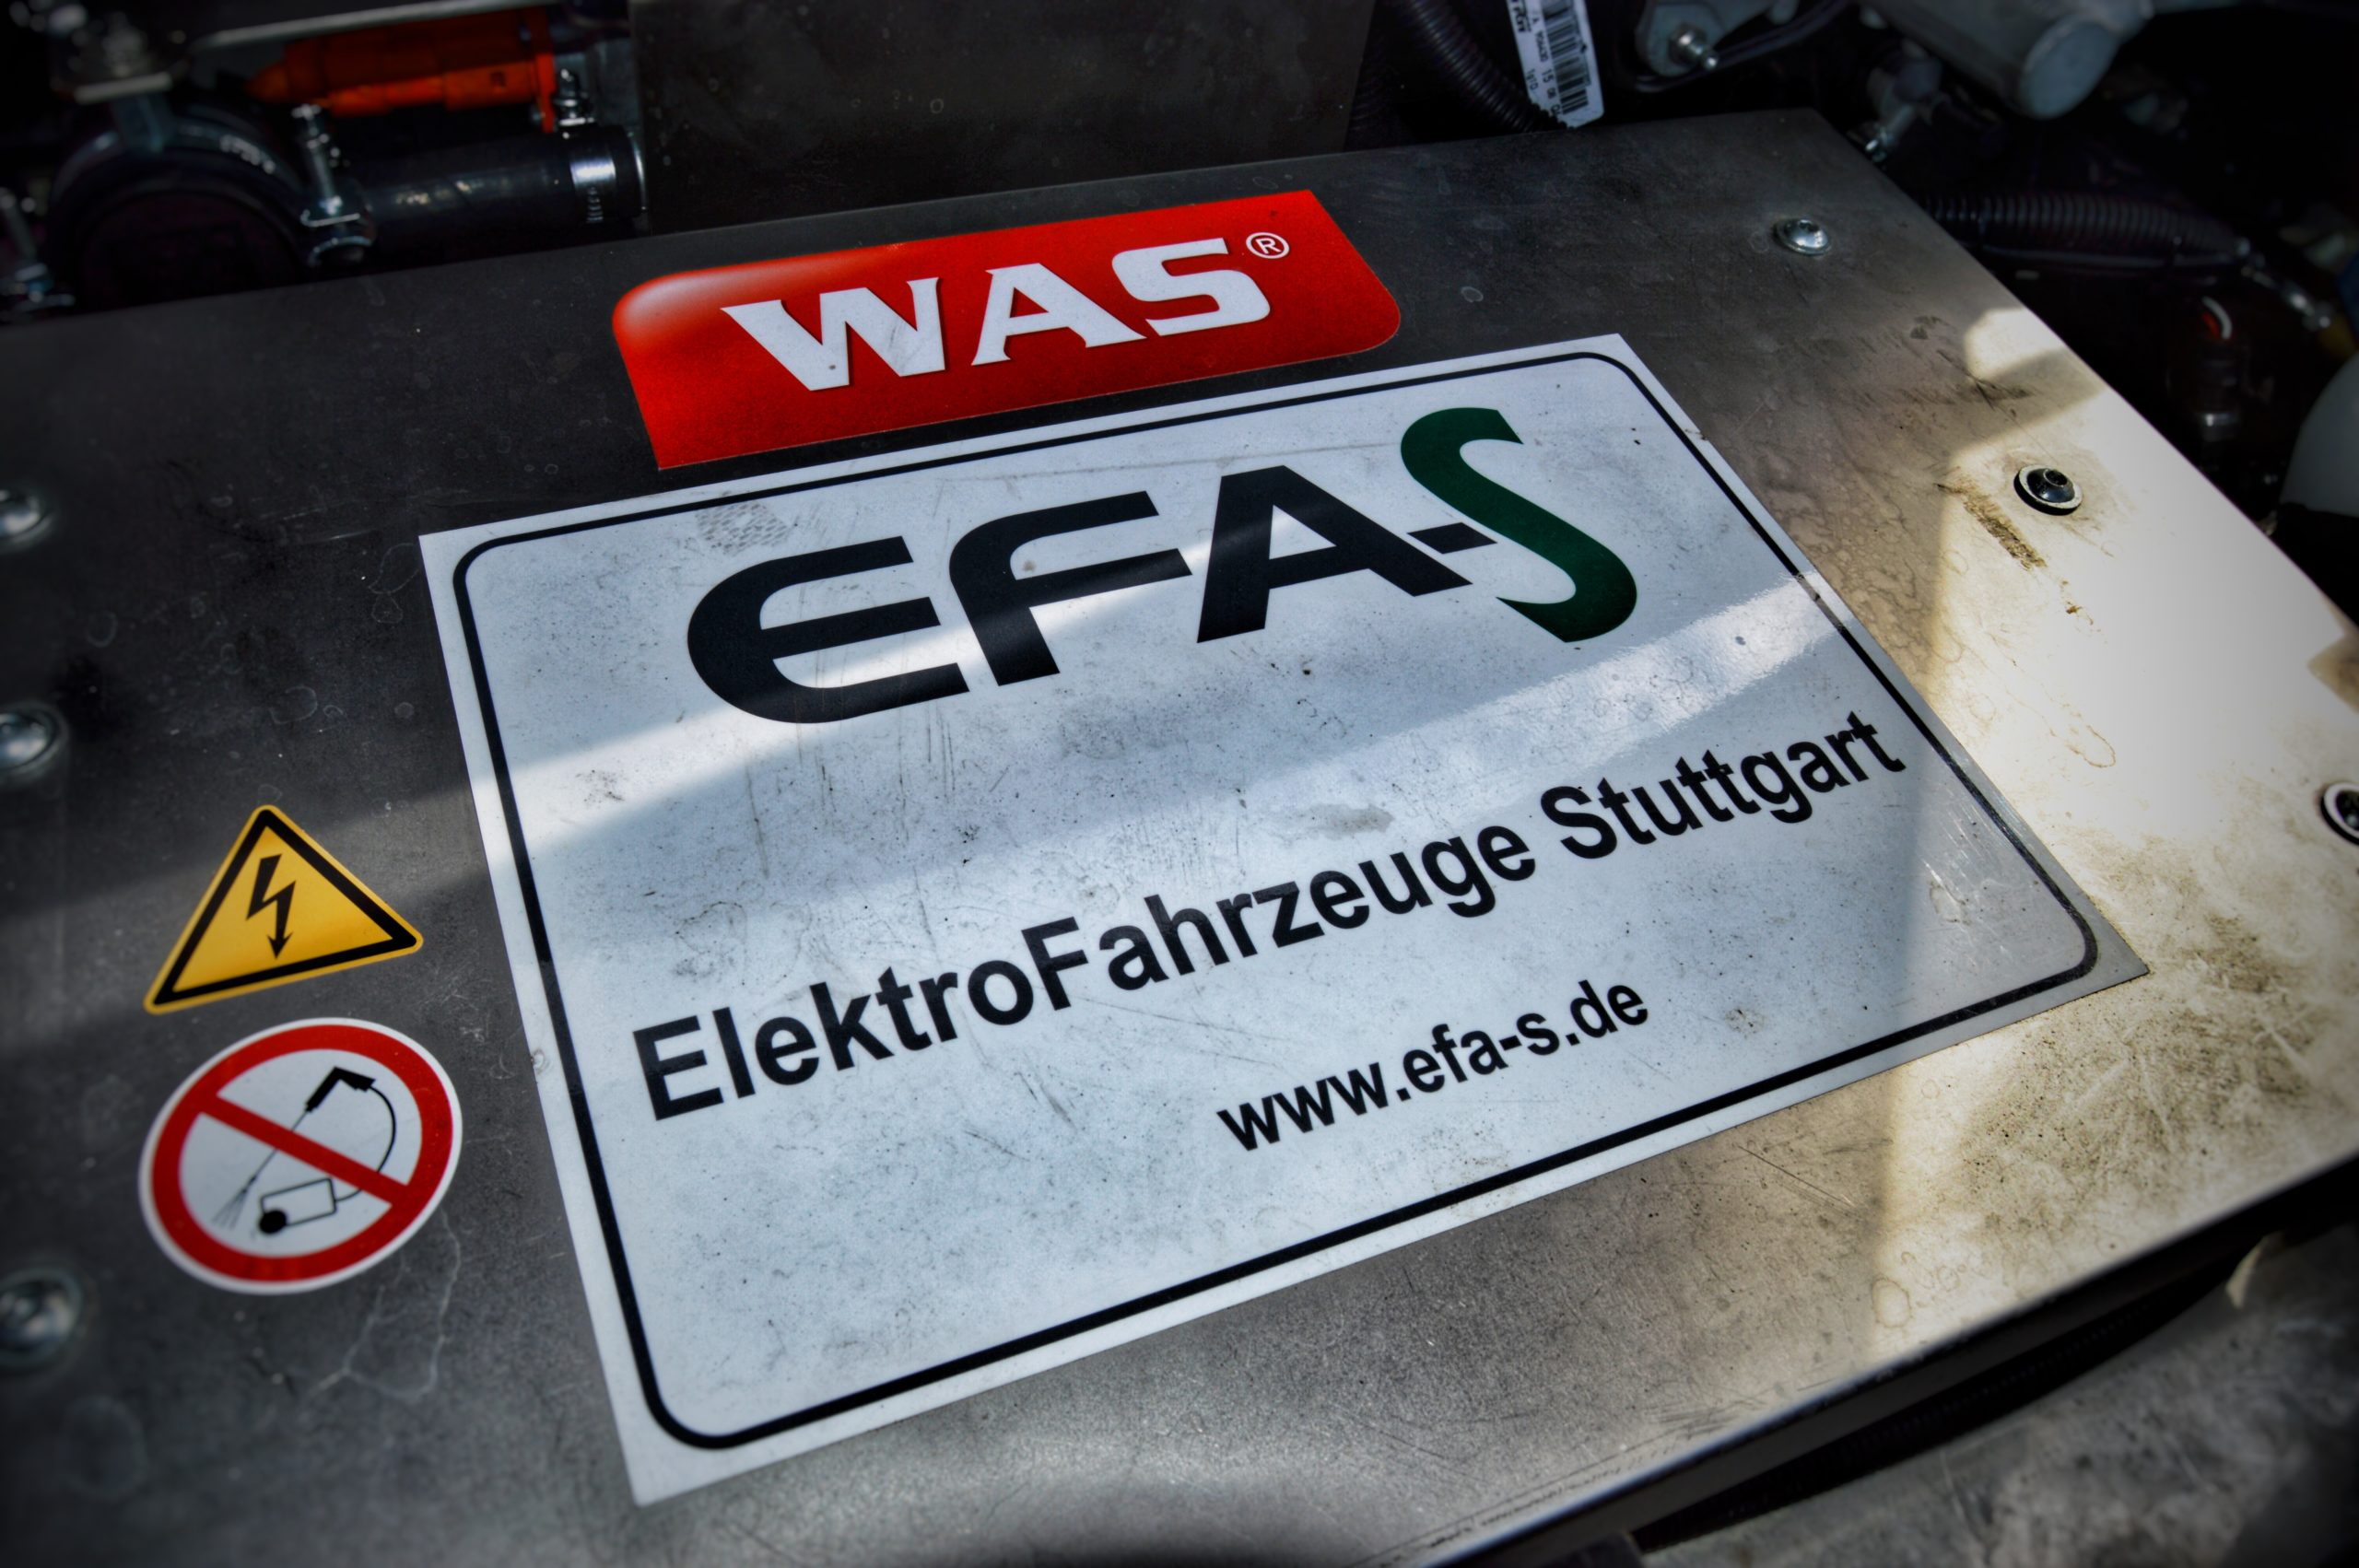 ERTW_WAS_Testphase_RWOchtrup_05